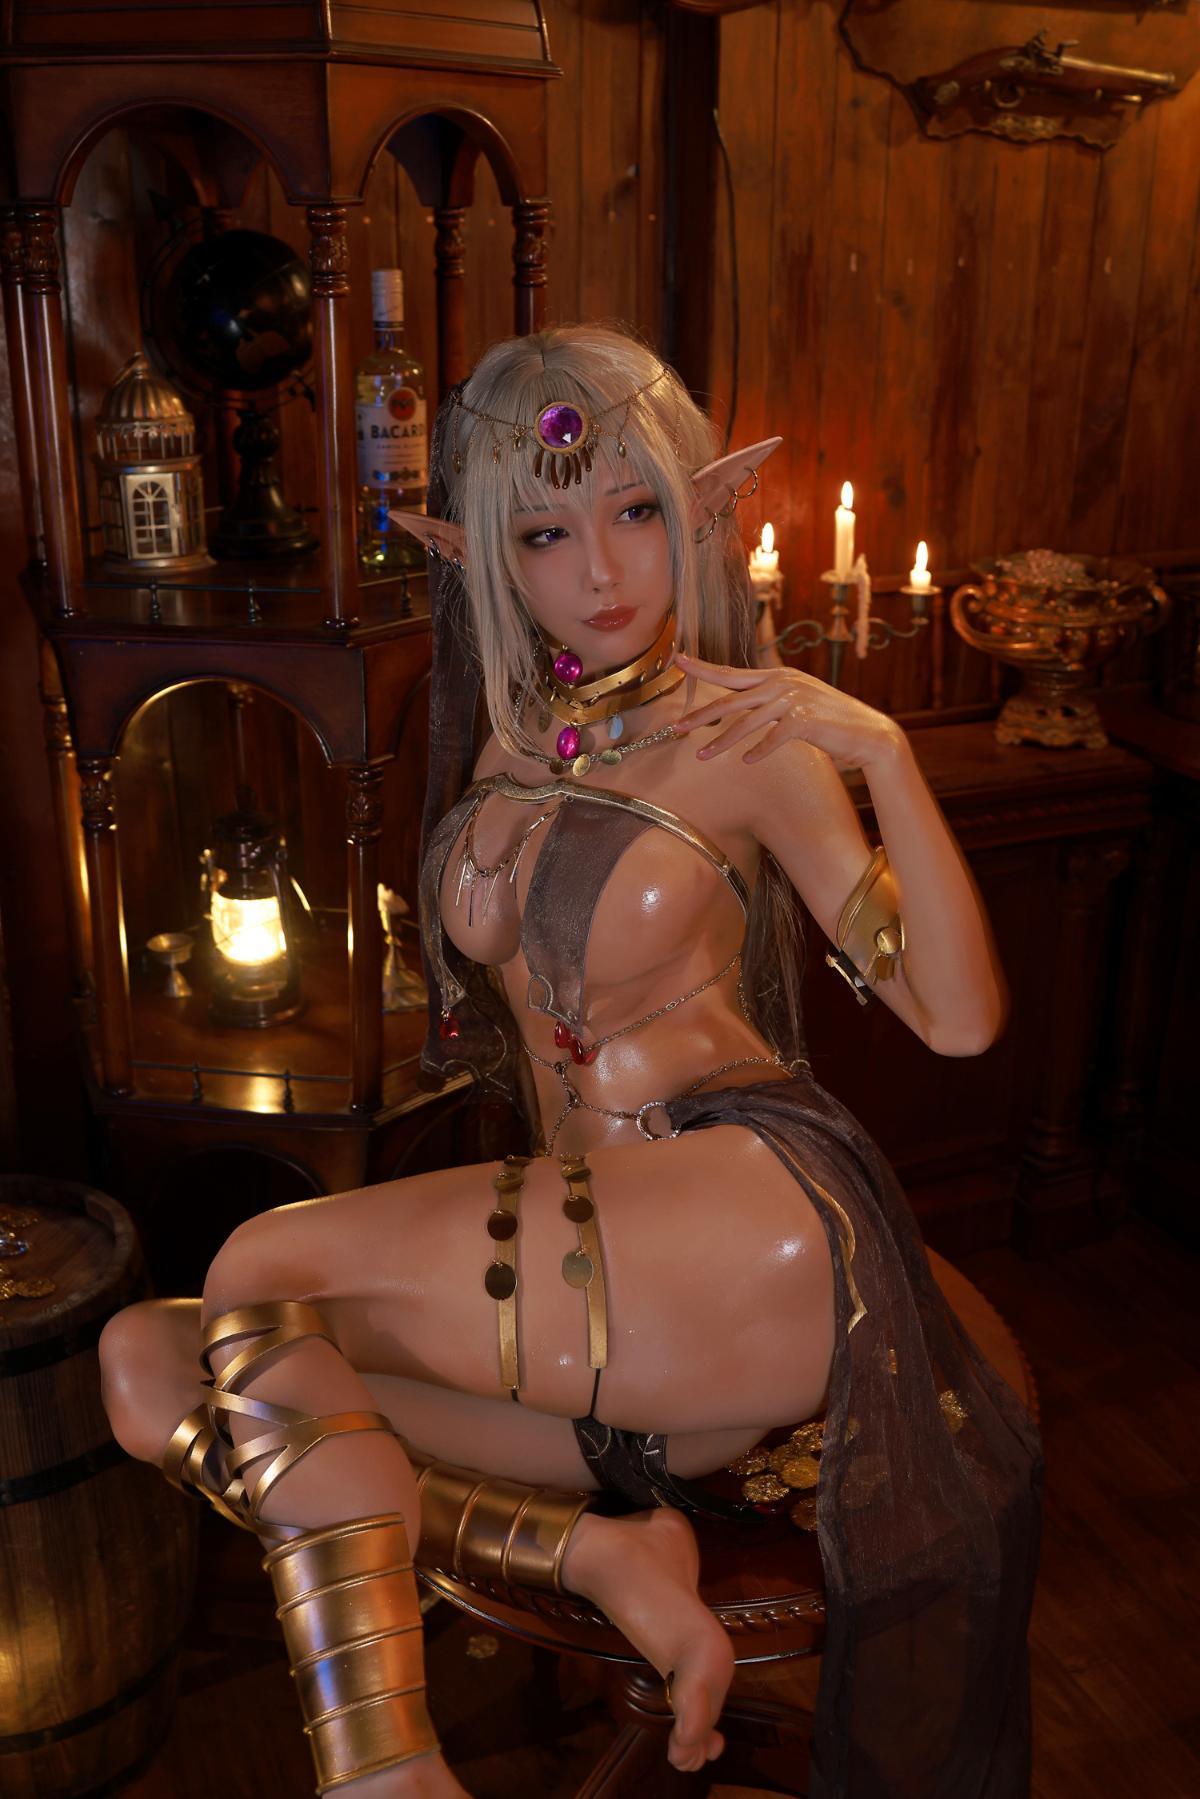 Tan Dancer Elf Succubus Cosplay by Aqua 22